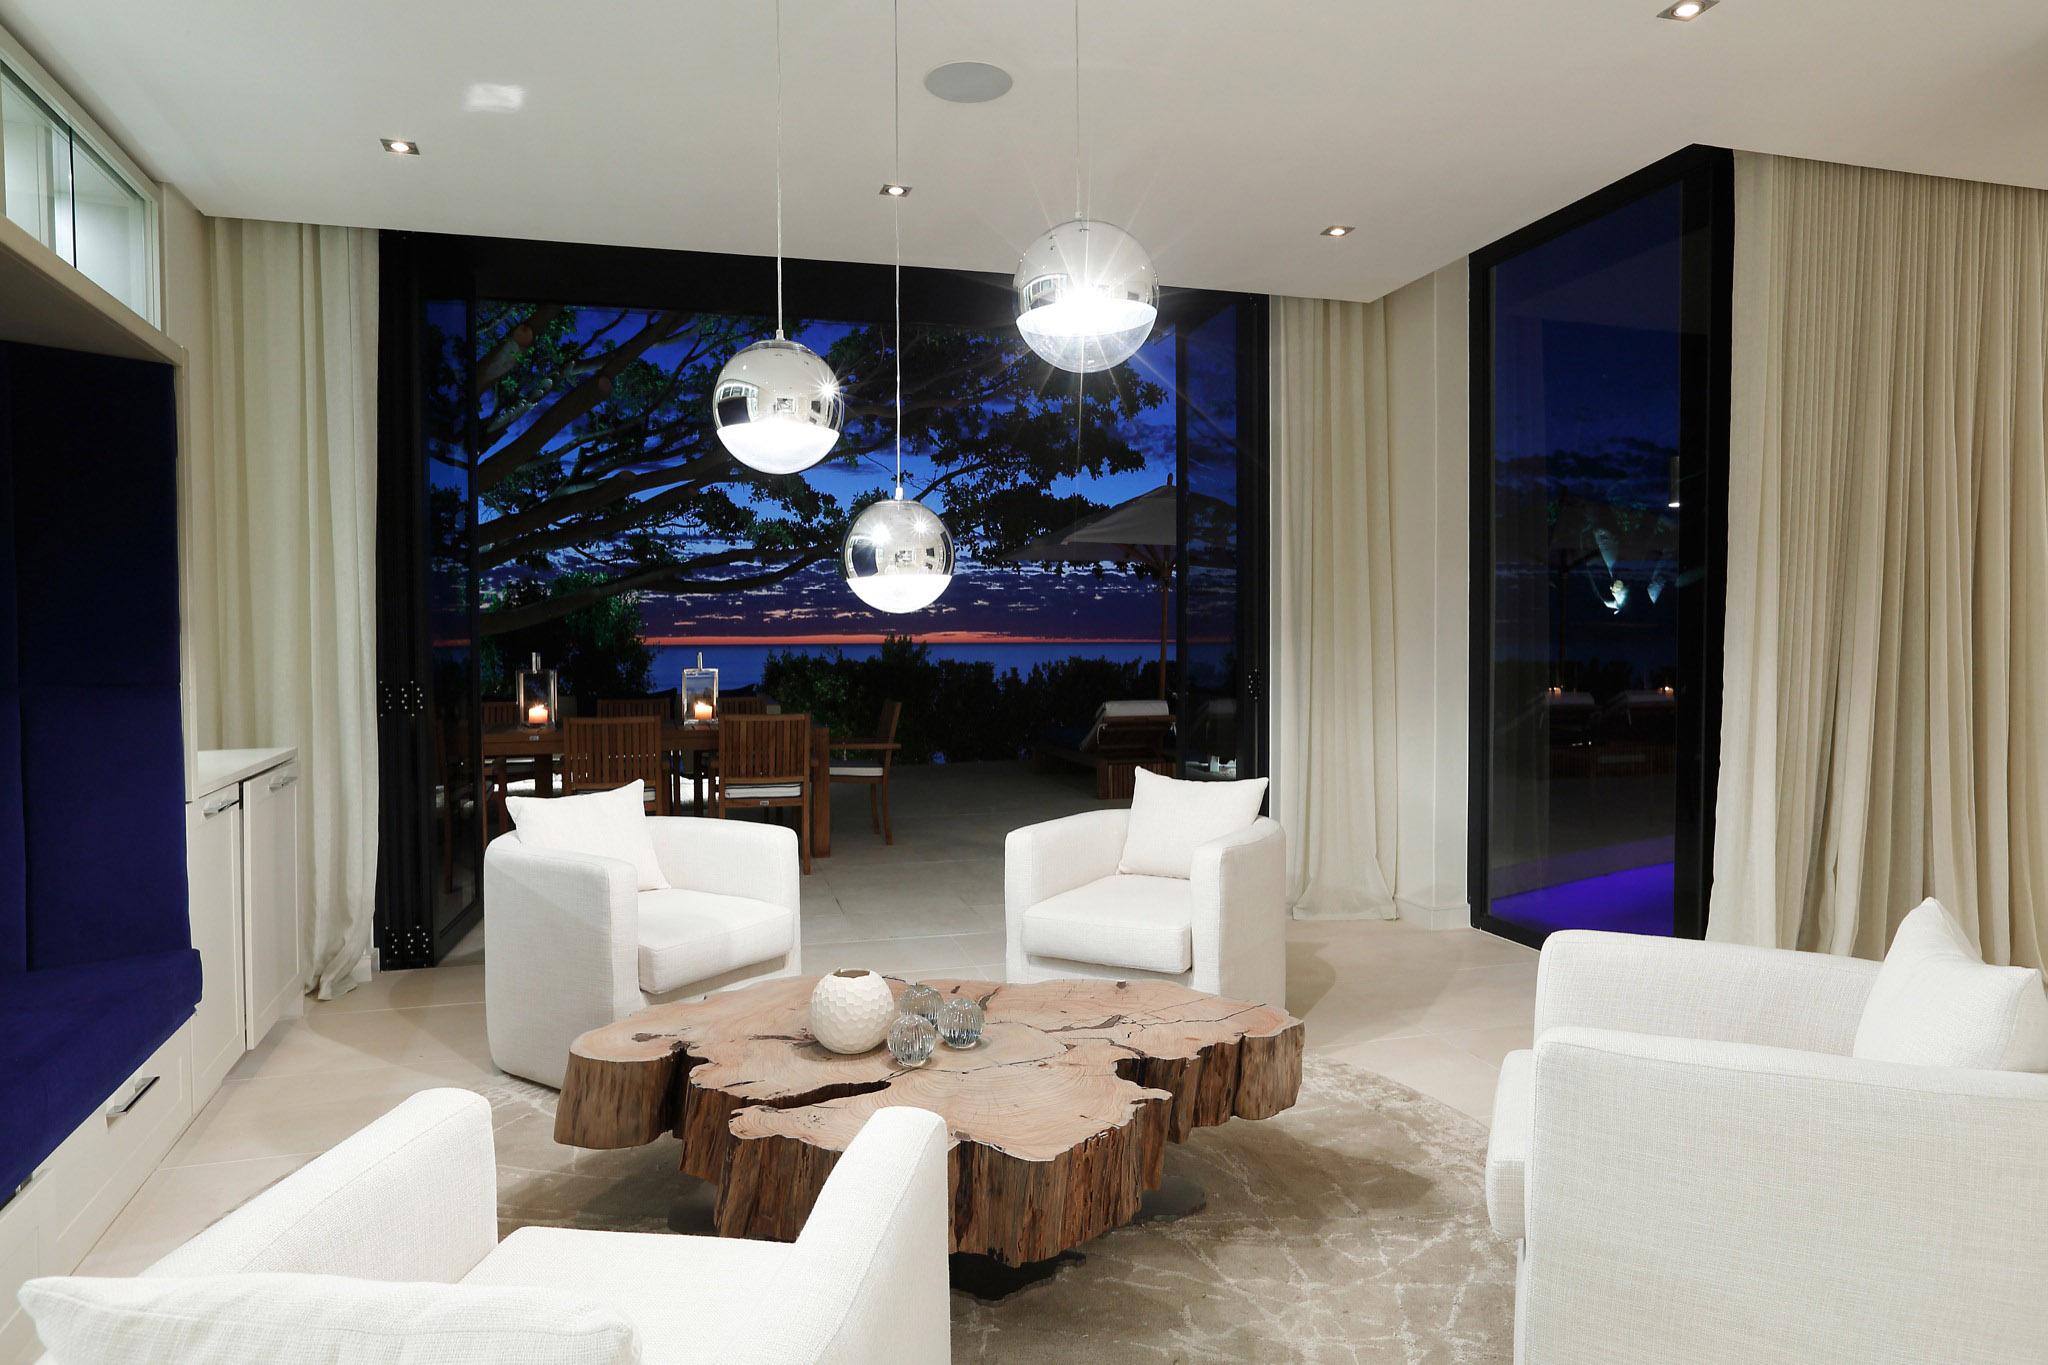 05 Small lounge-7 2048.jpg